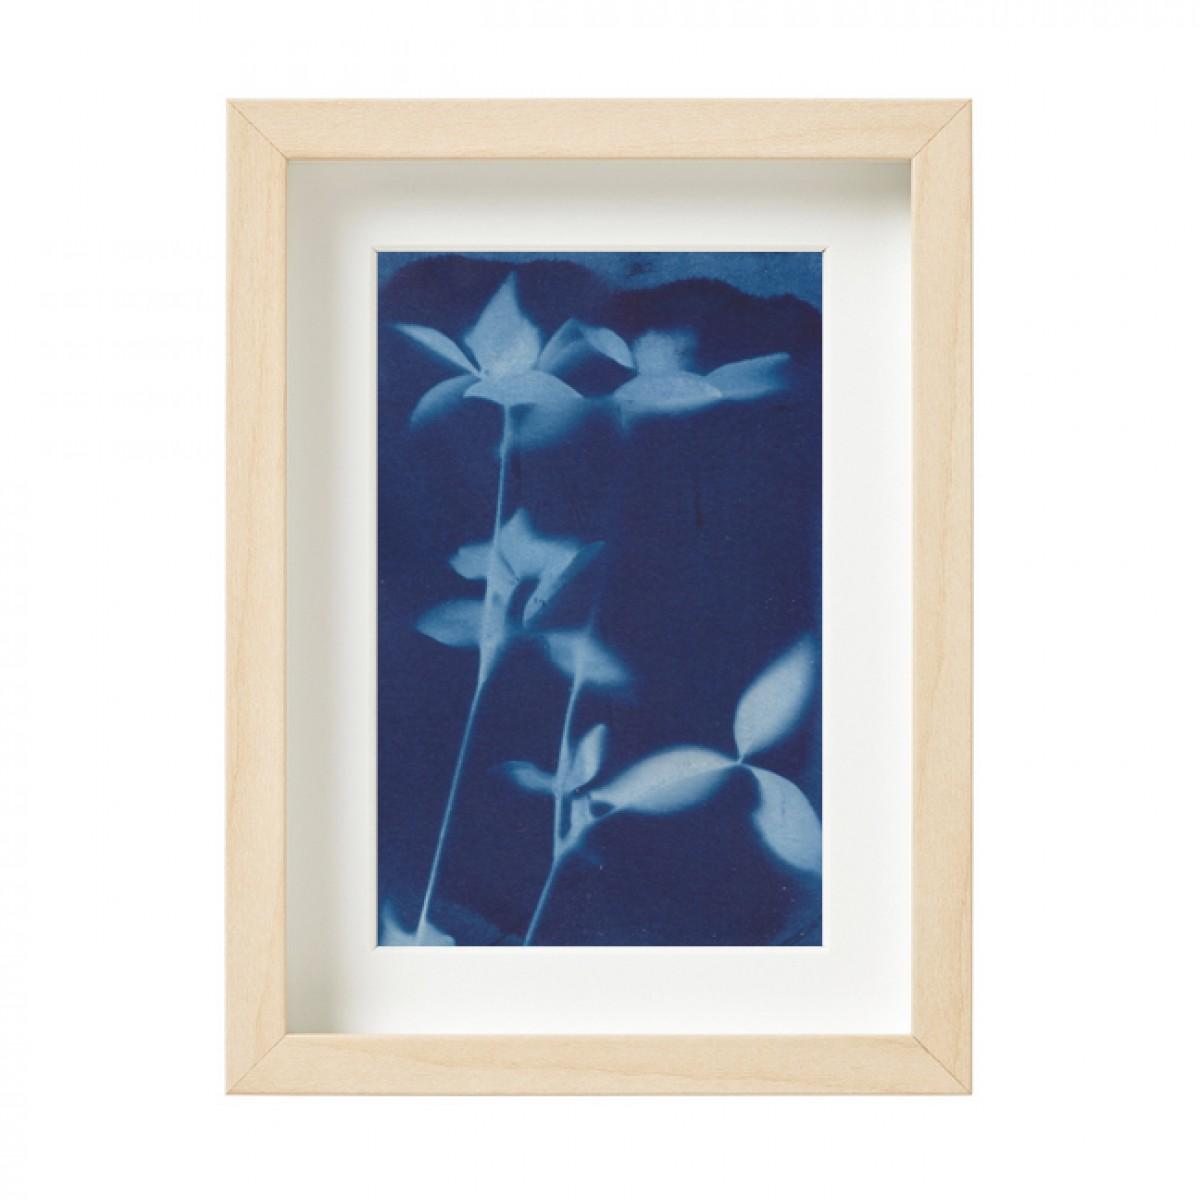 Anka Büchler, Floraler Blaudruck,Cyanotypie, Unikat, A6, gerahmt, Motiv 19